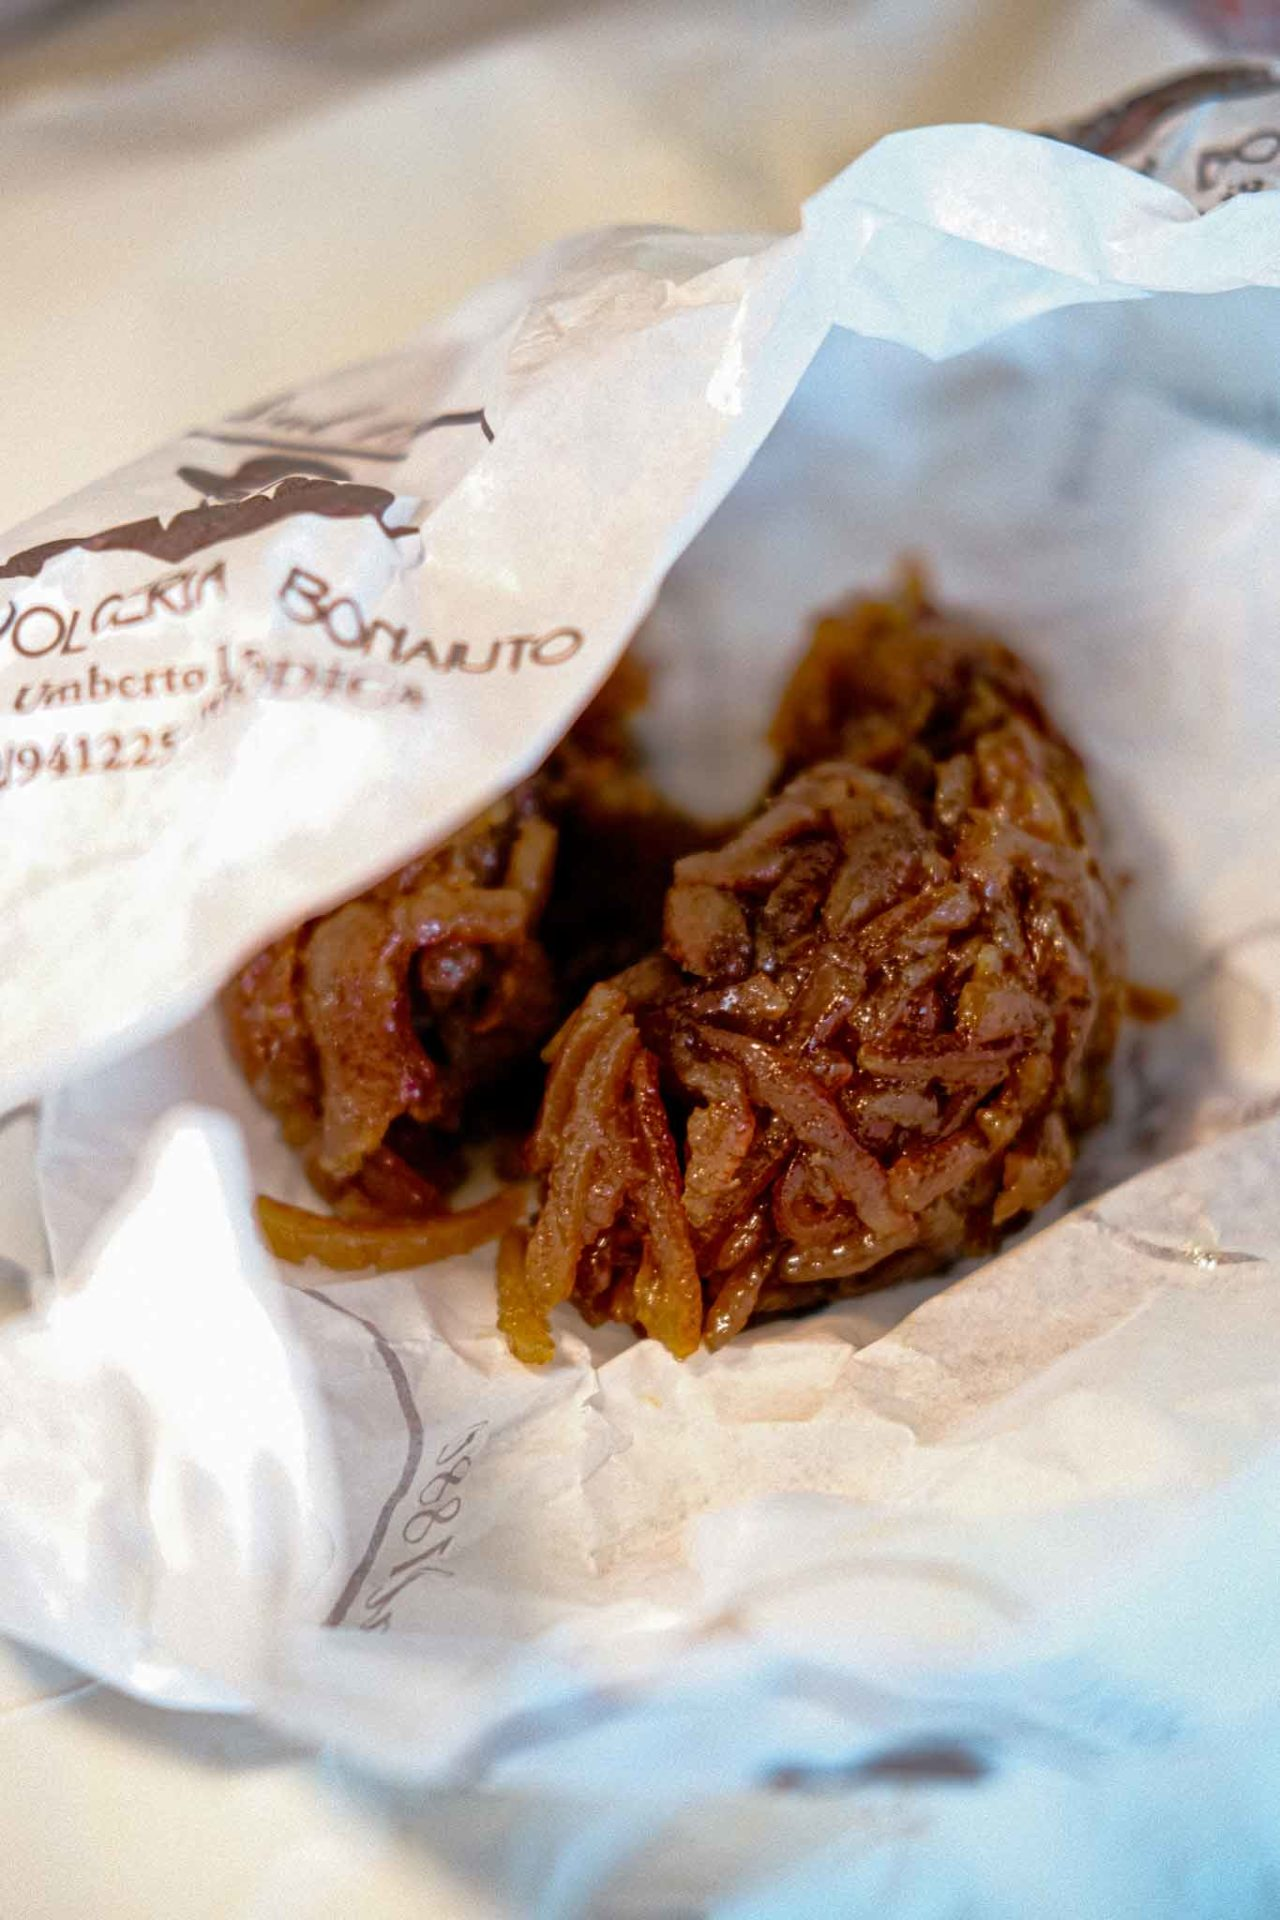 Antica Dolceria Bonajuto aranciata